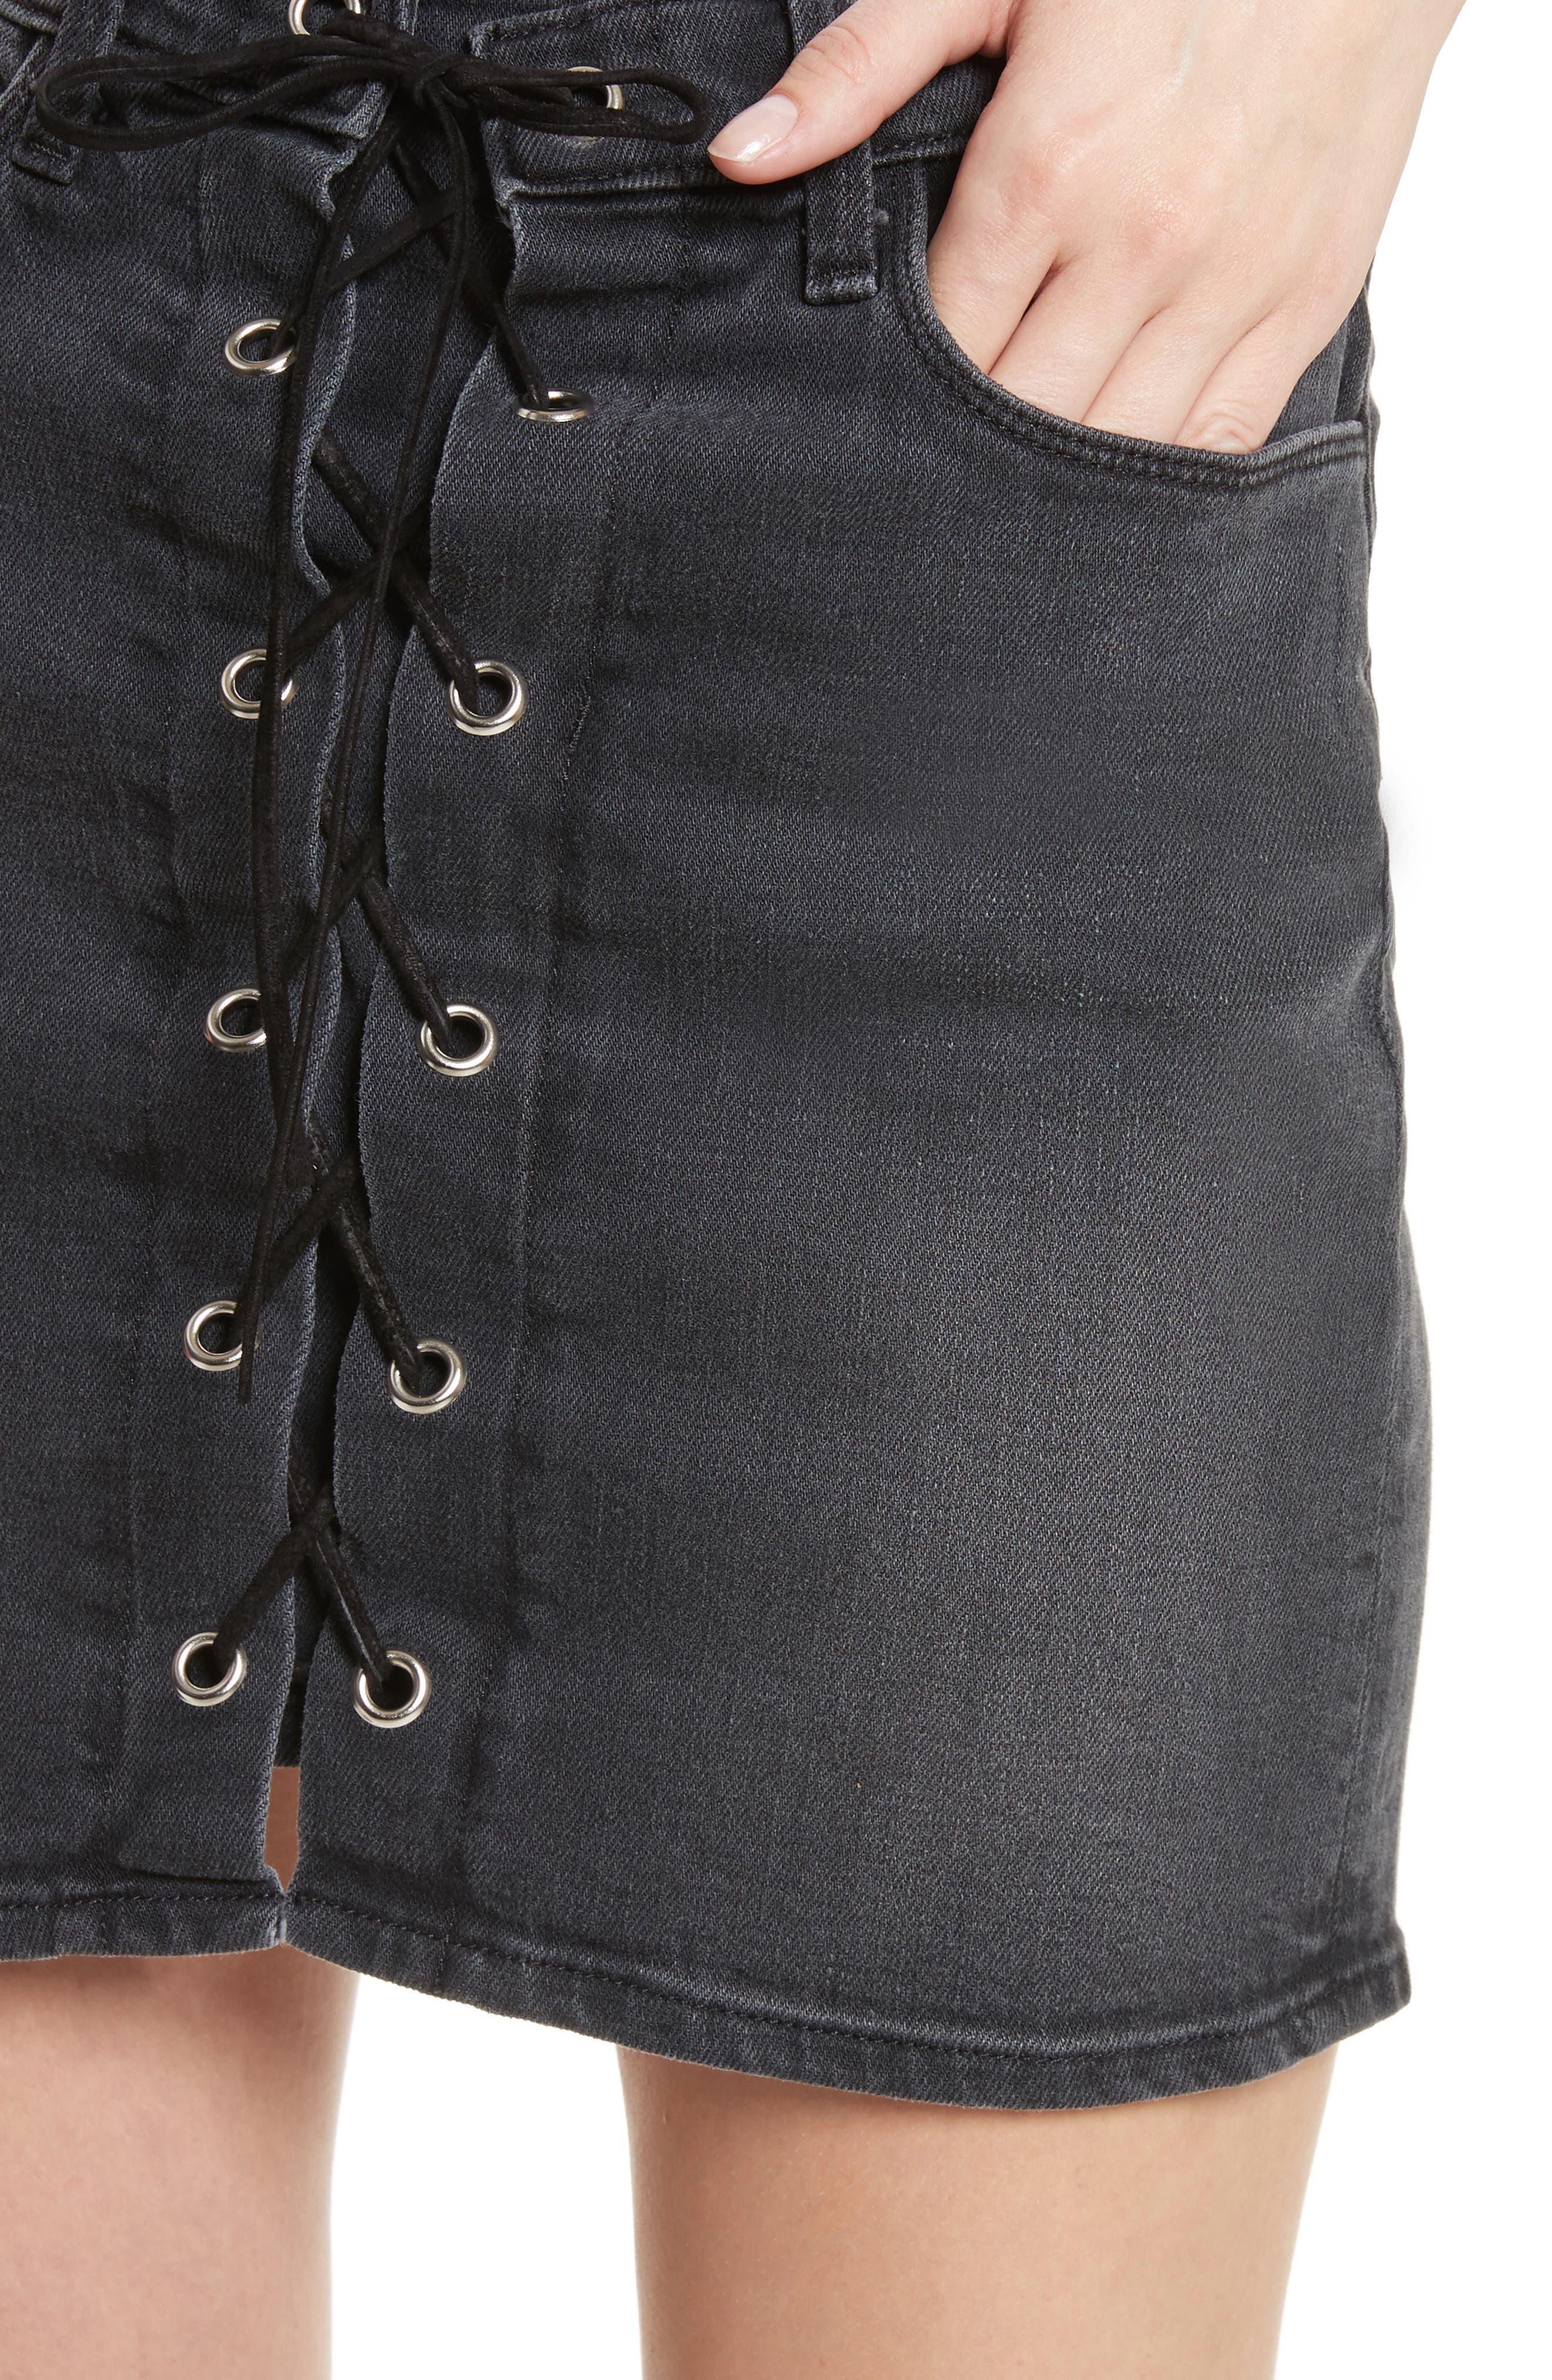 Portia Lace Up Denim Skirt,                             Alternate thumbnail 4, color,                             006